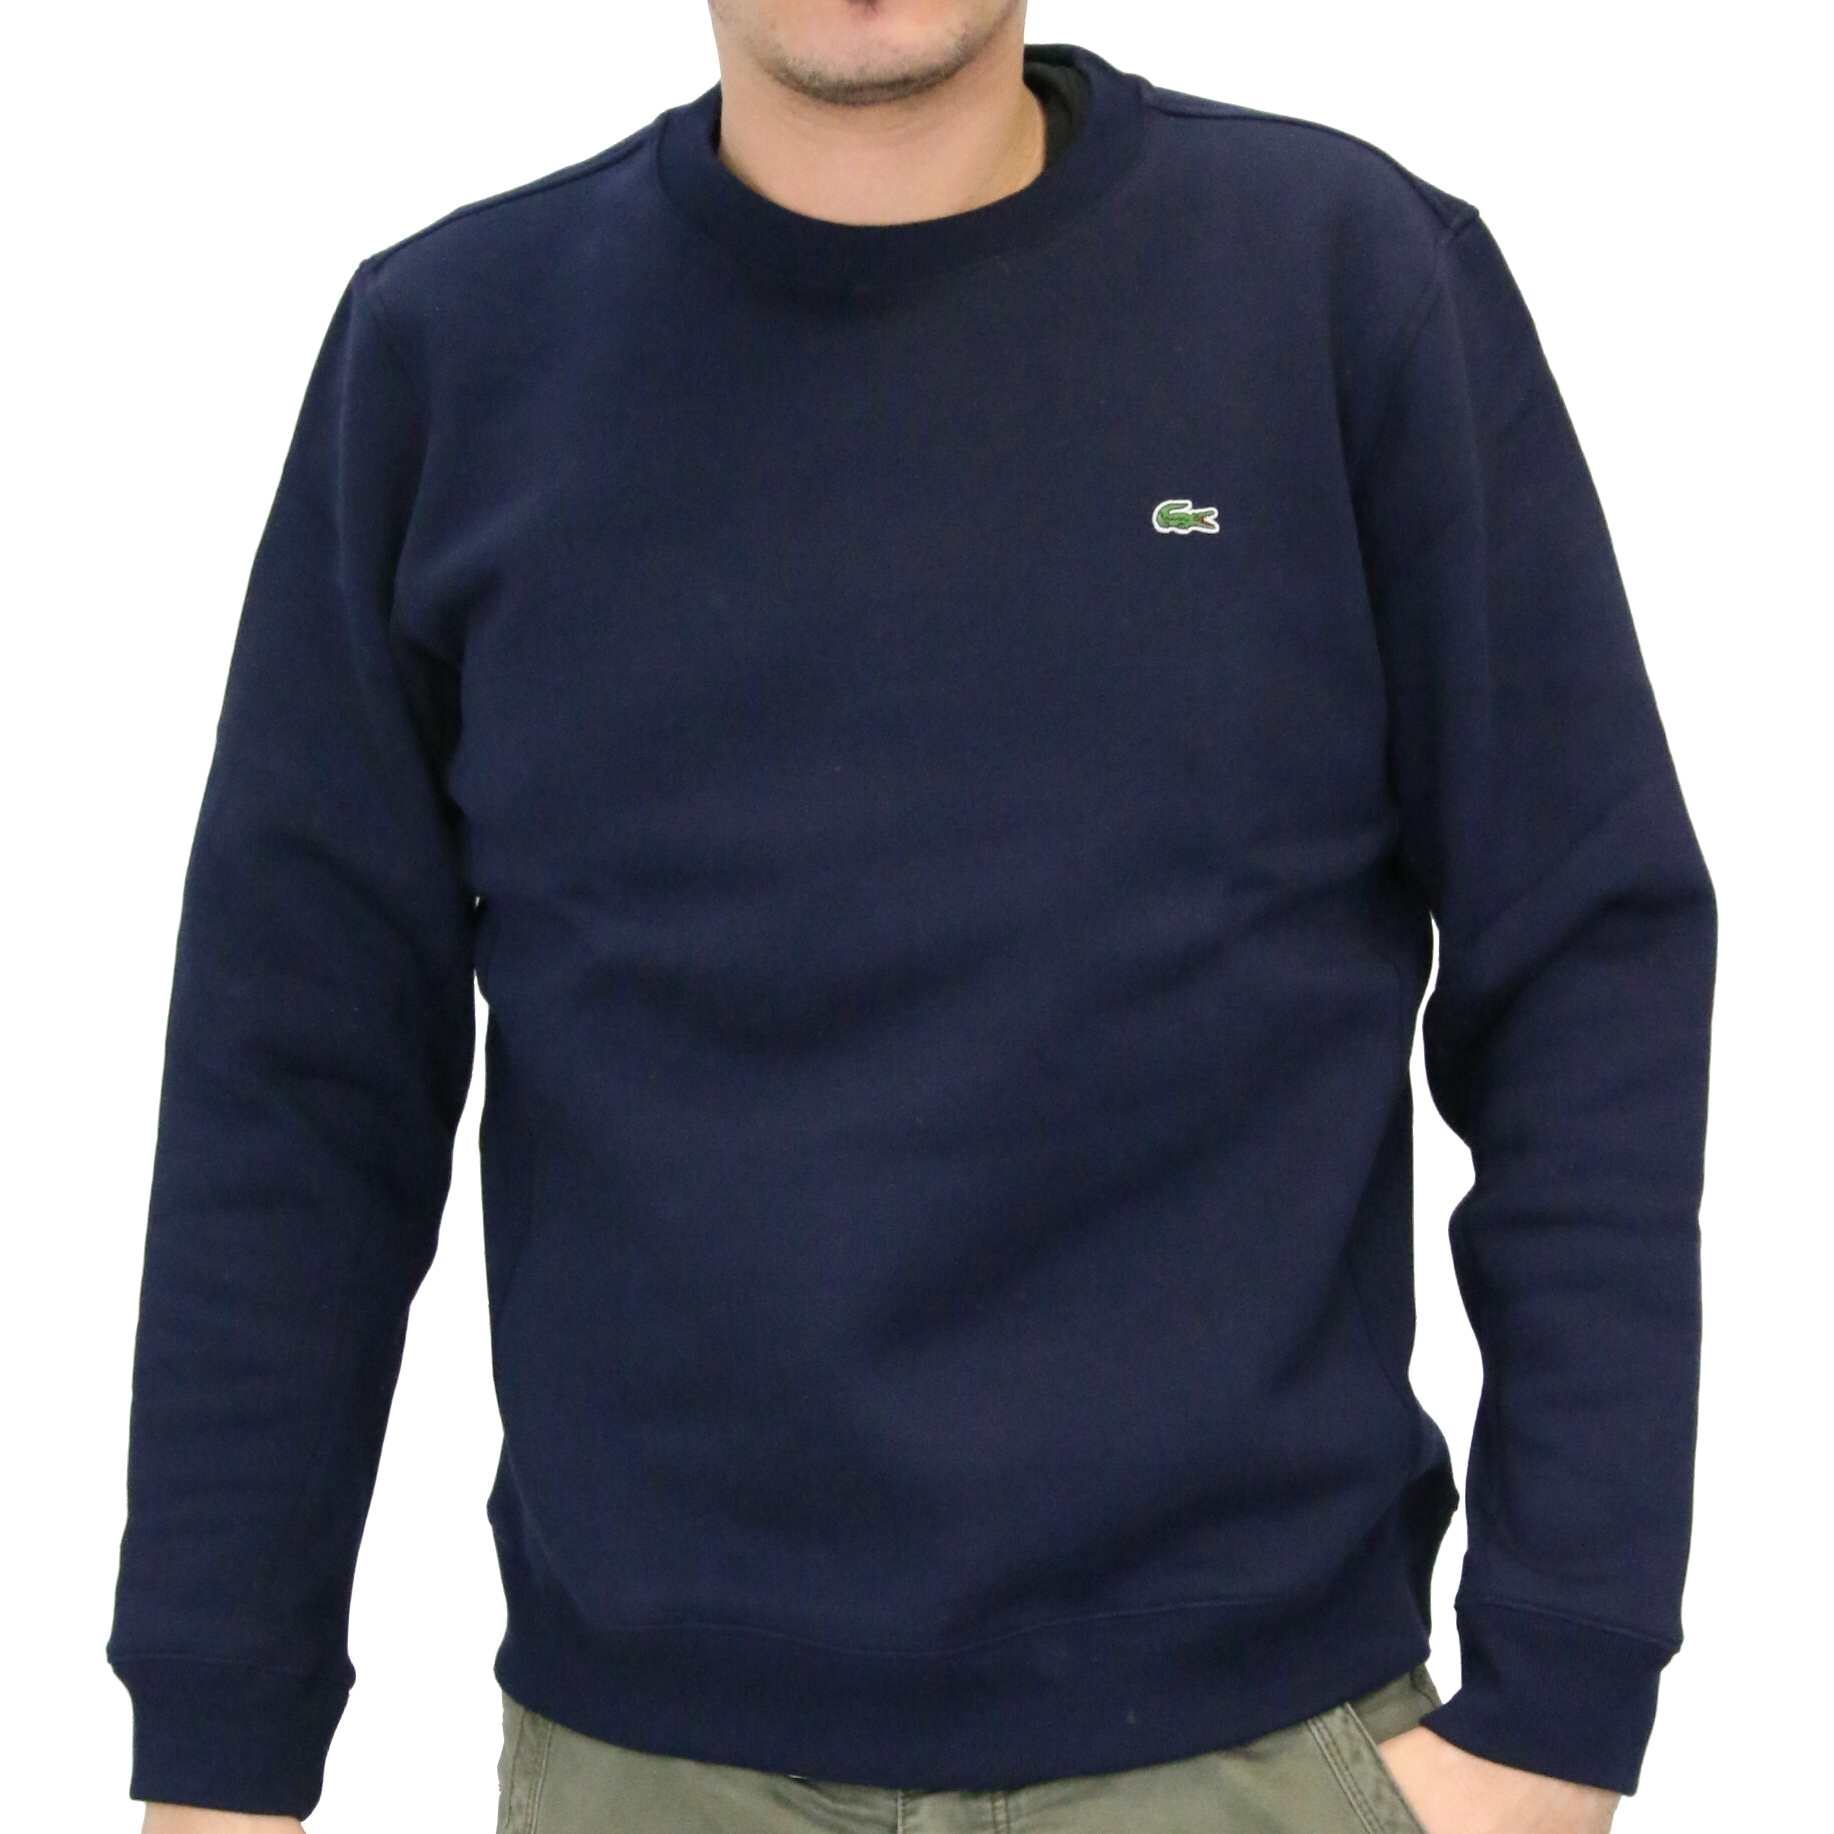 lacoste sweatshirt pullover rundhals langarm herren ebay. Black Bedroom Furniture Sets. Home Design Ideas